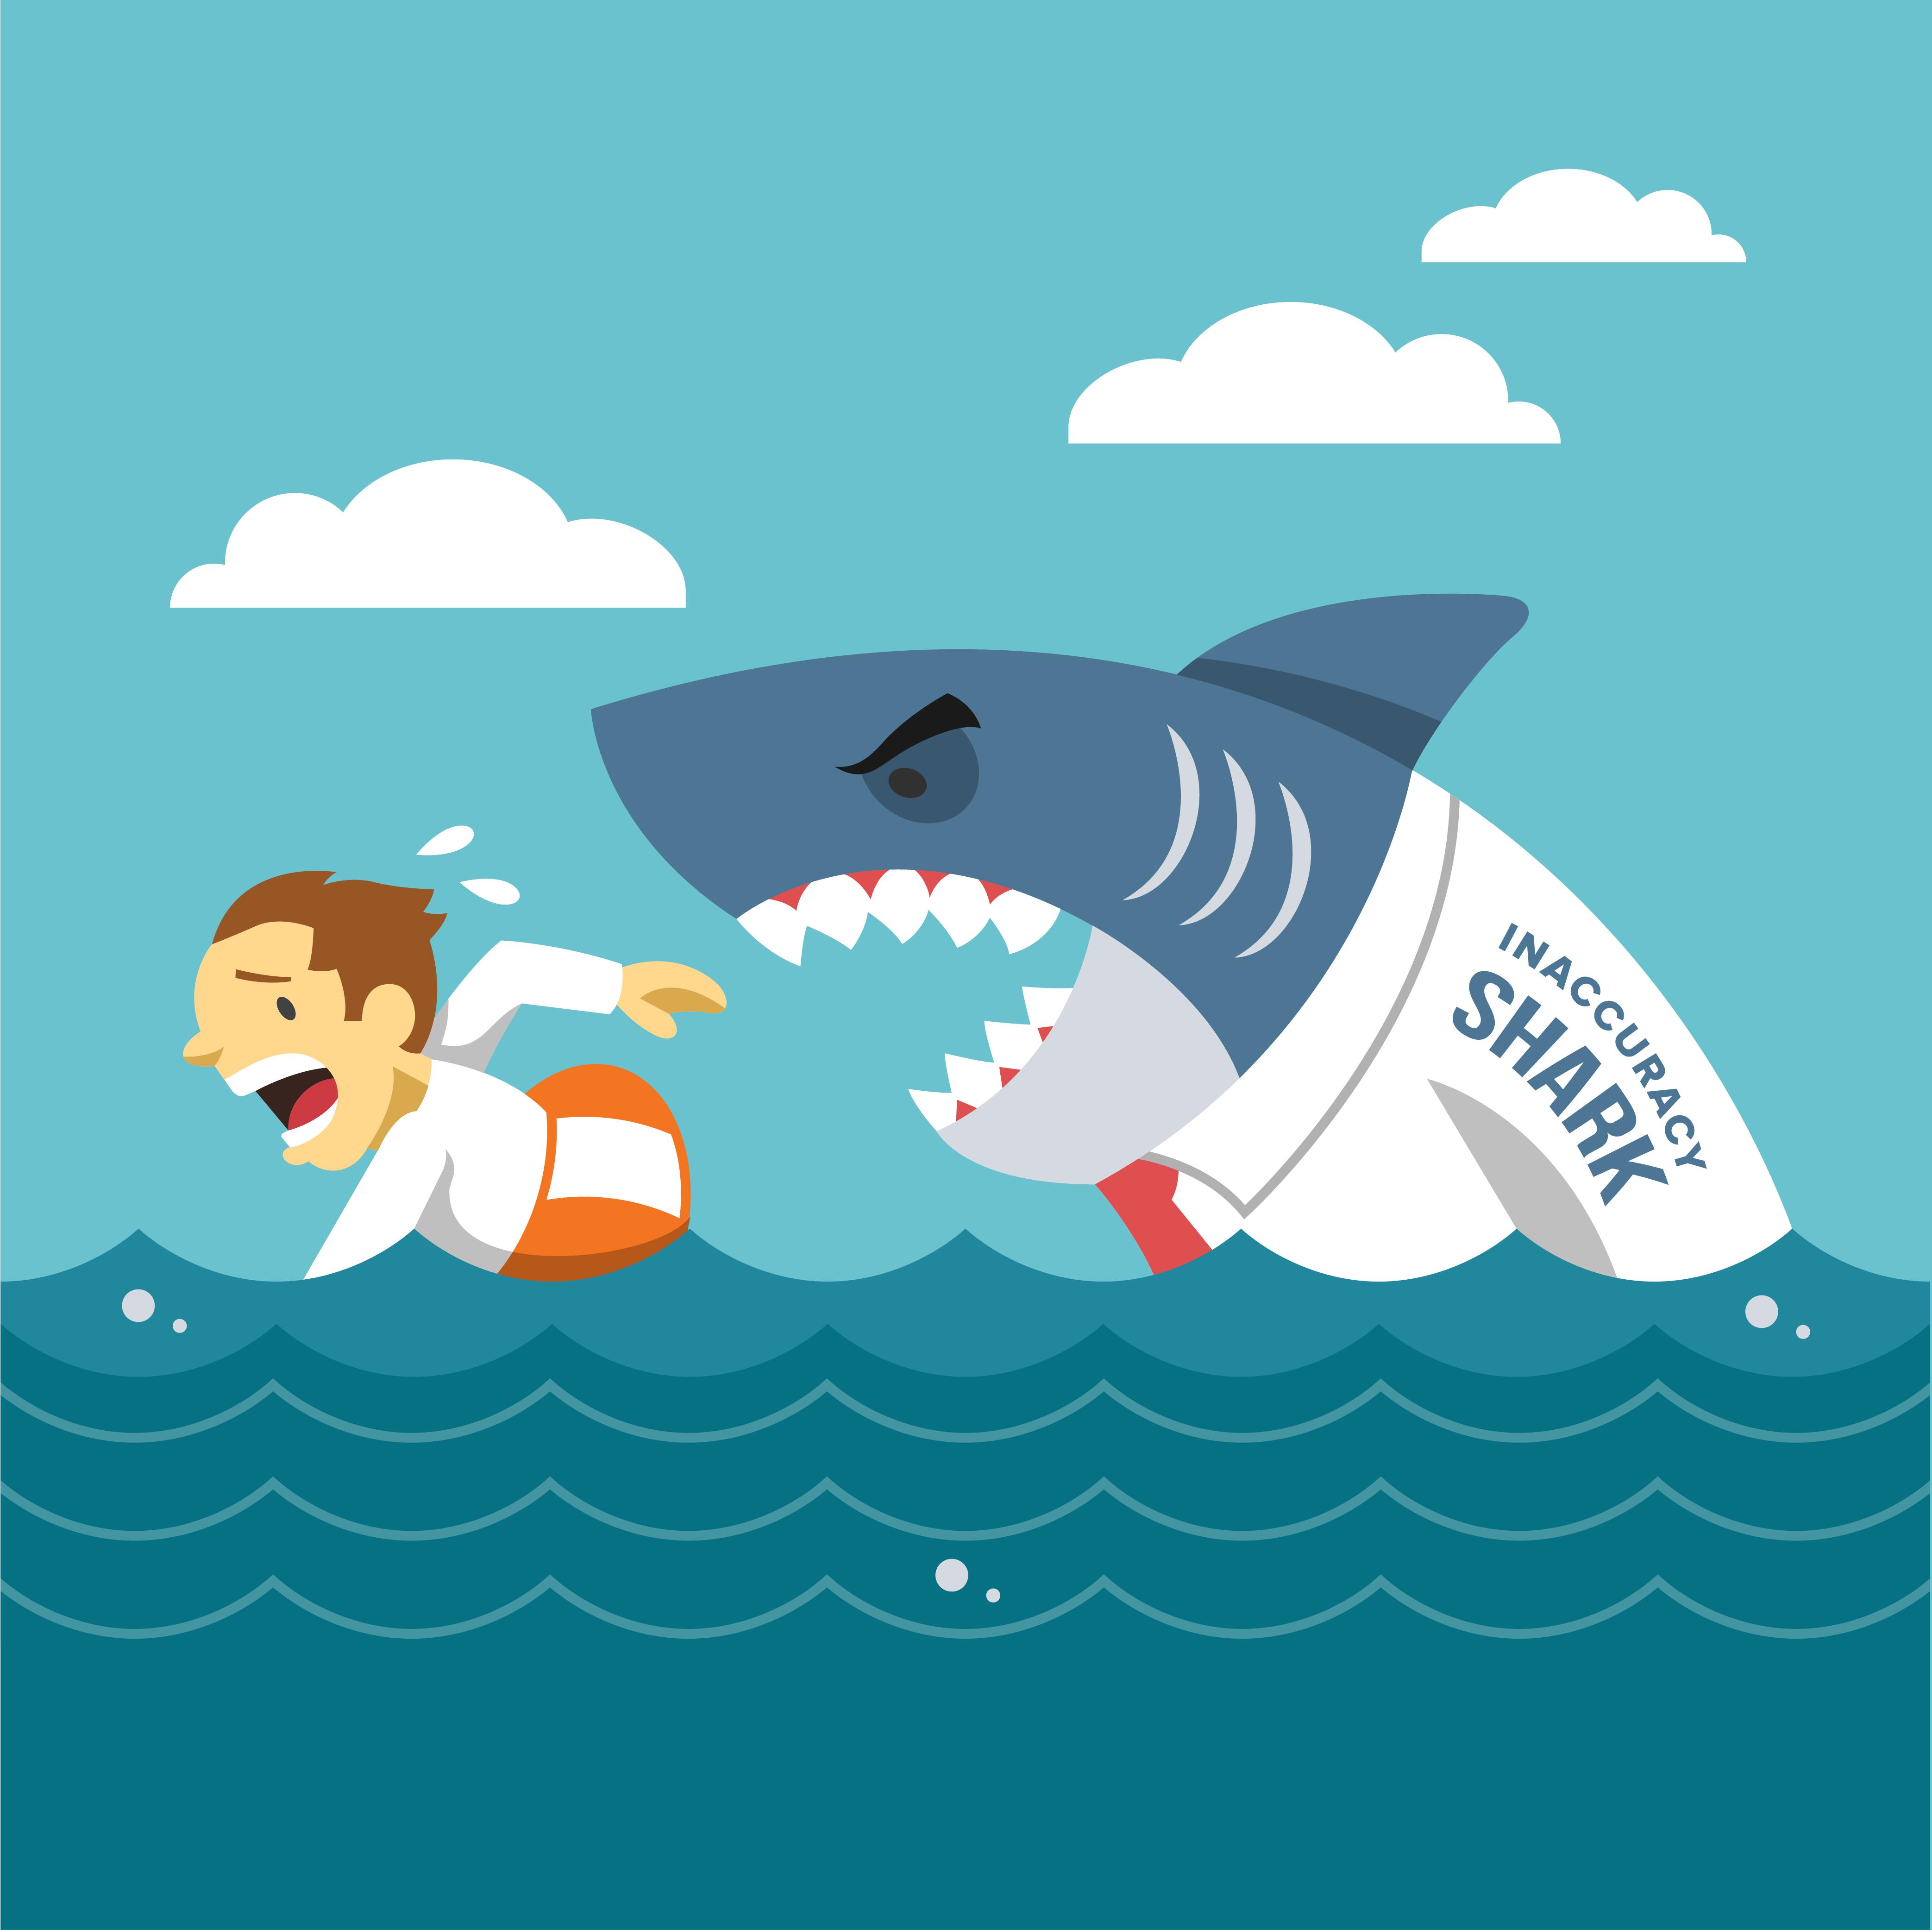 inaccuracy_shark-01-1.png